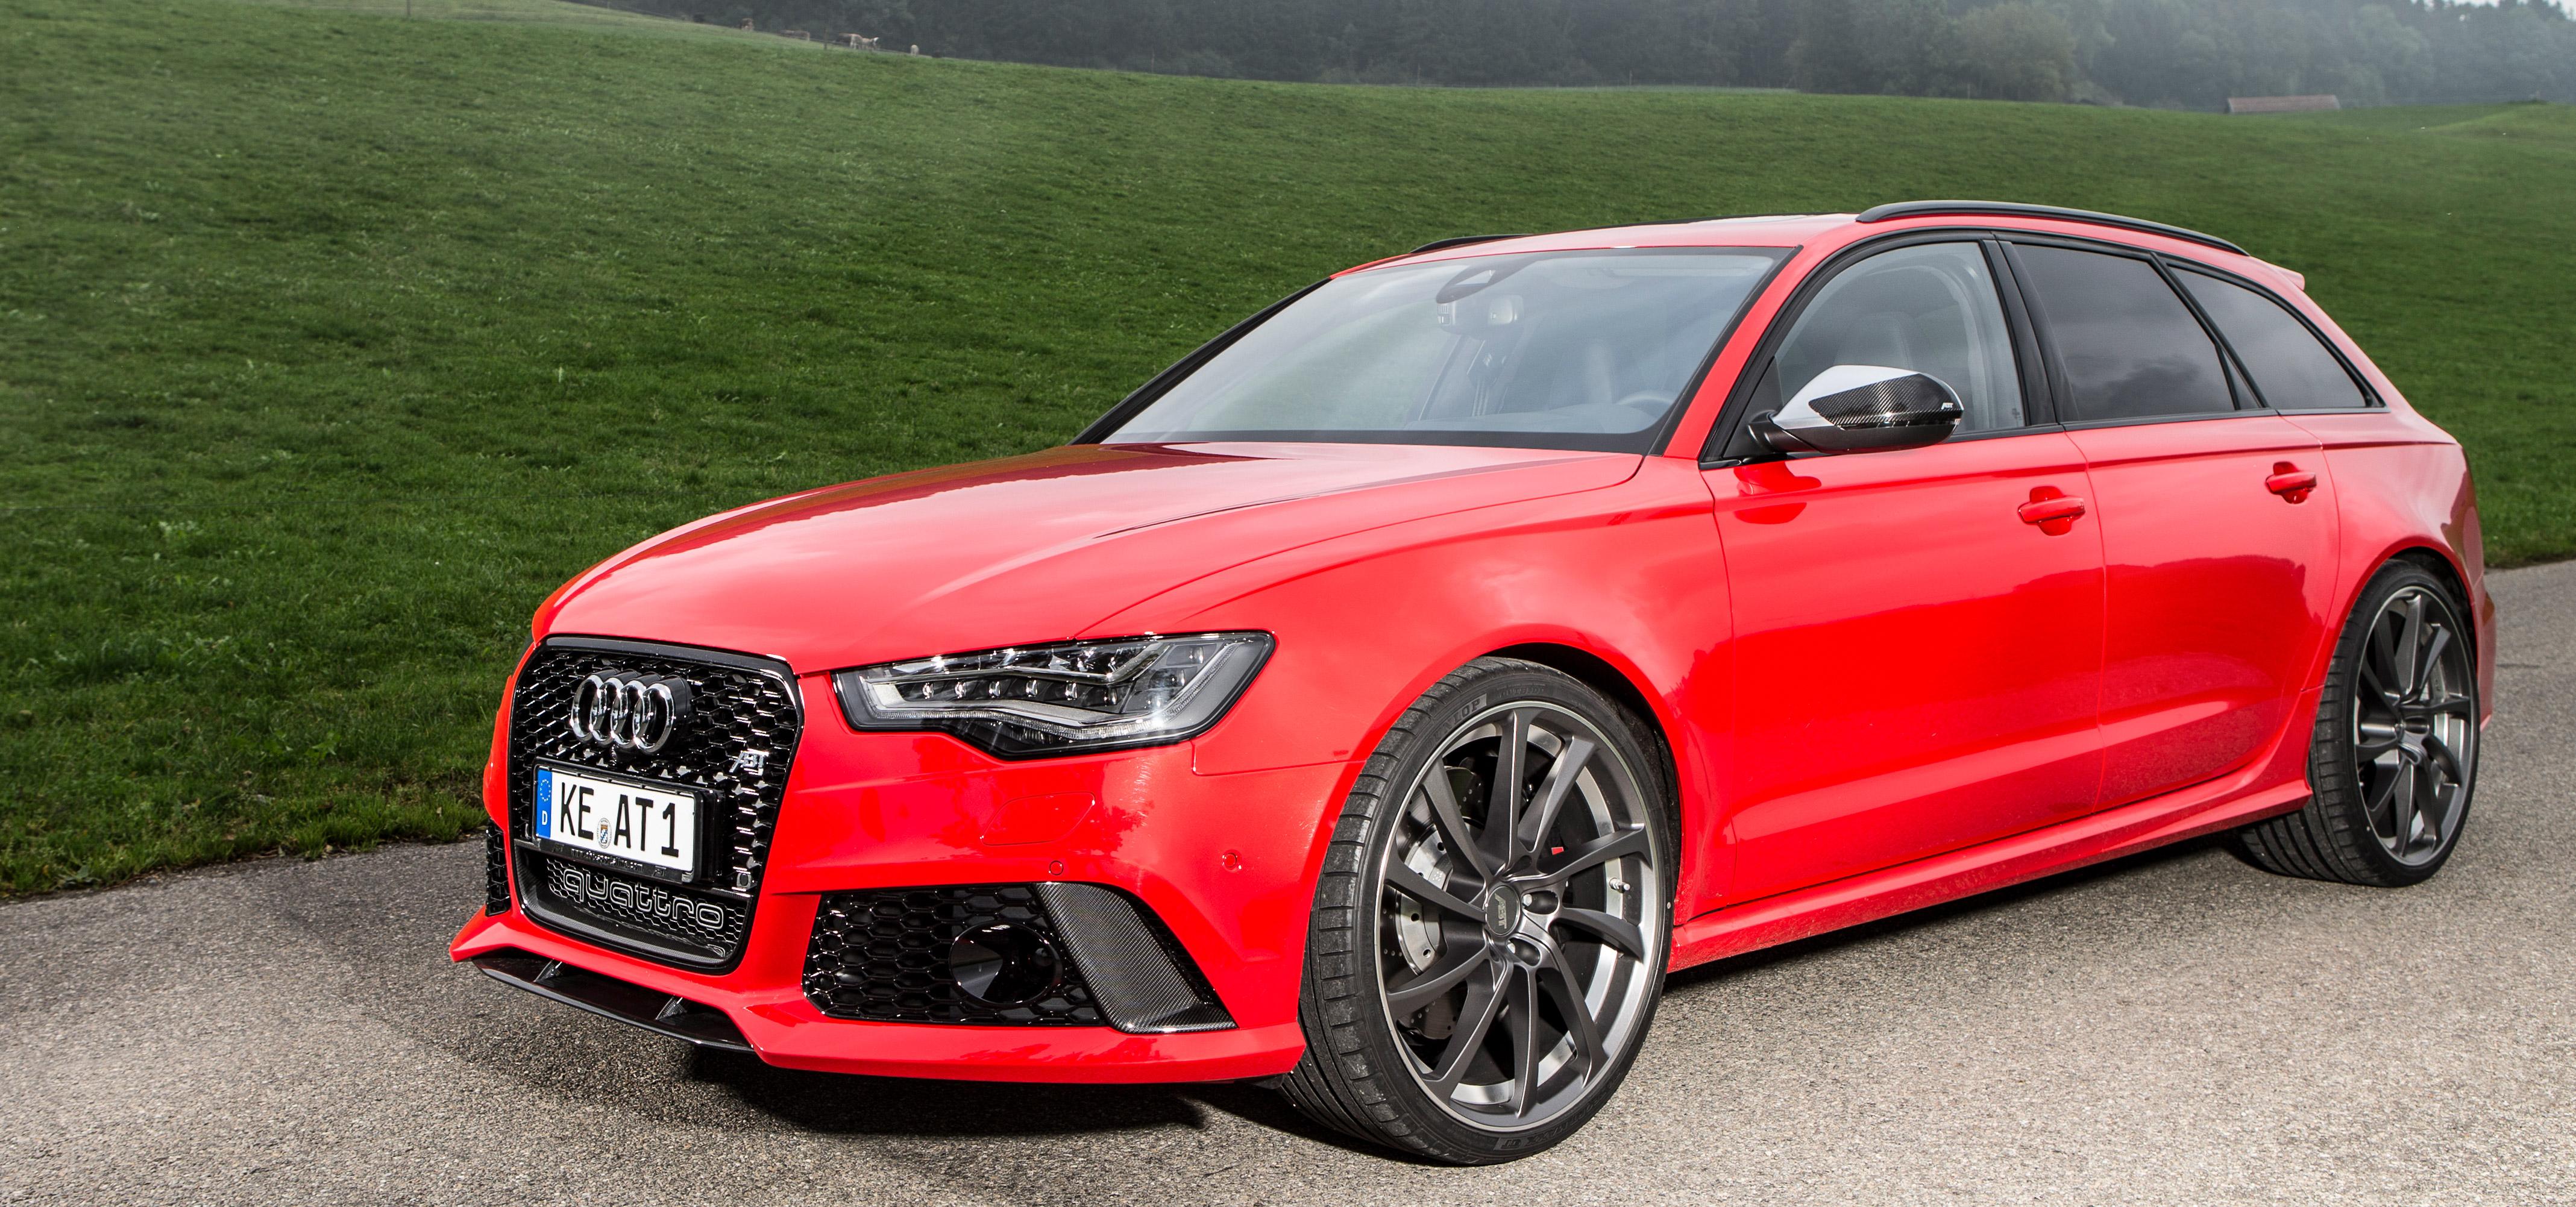 Audi RS ABT Sportsline - Audi rs6